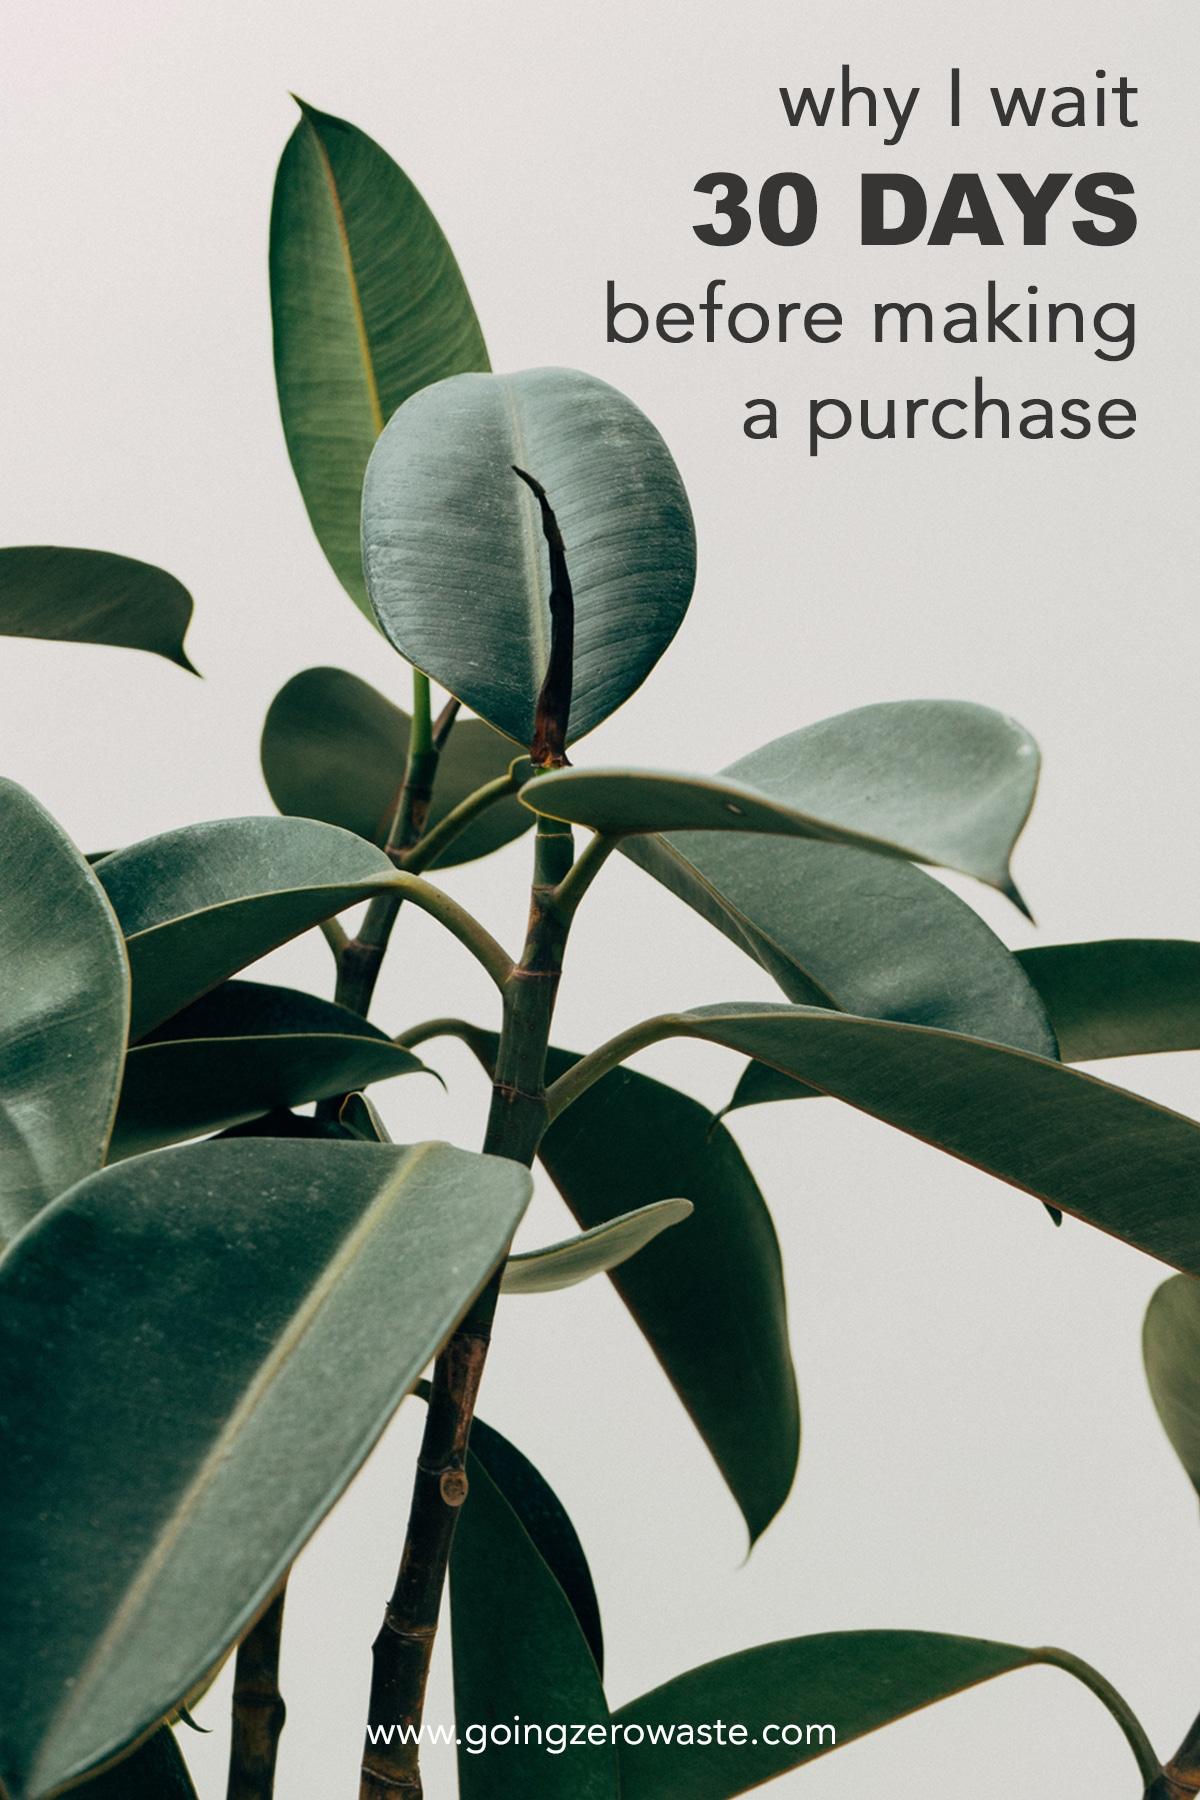 Why I Wait 30 Days Before I Make a Purchase from www.goingzerowaste.com #zerowaste #ecofriendly #gogreen #sustainable #minimalism #minimal